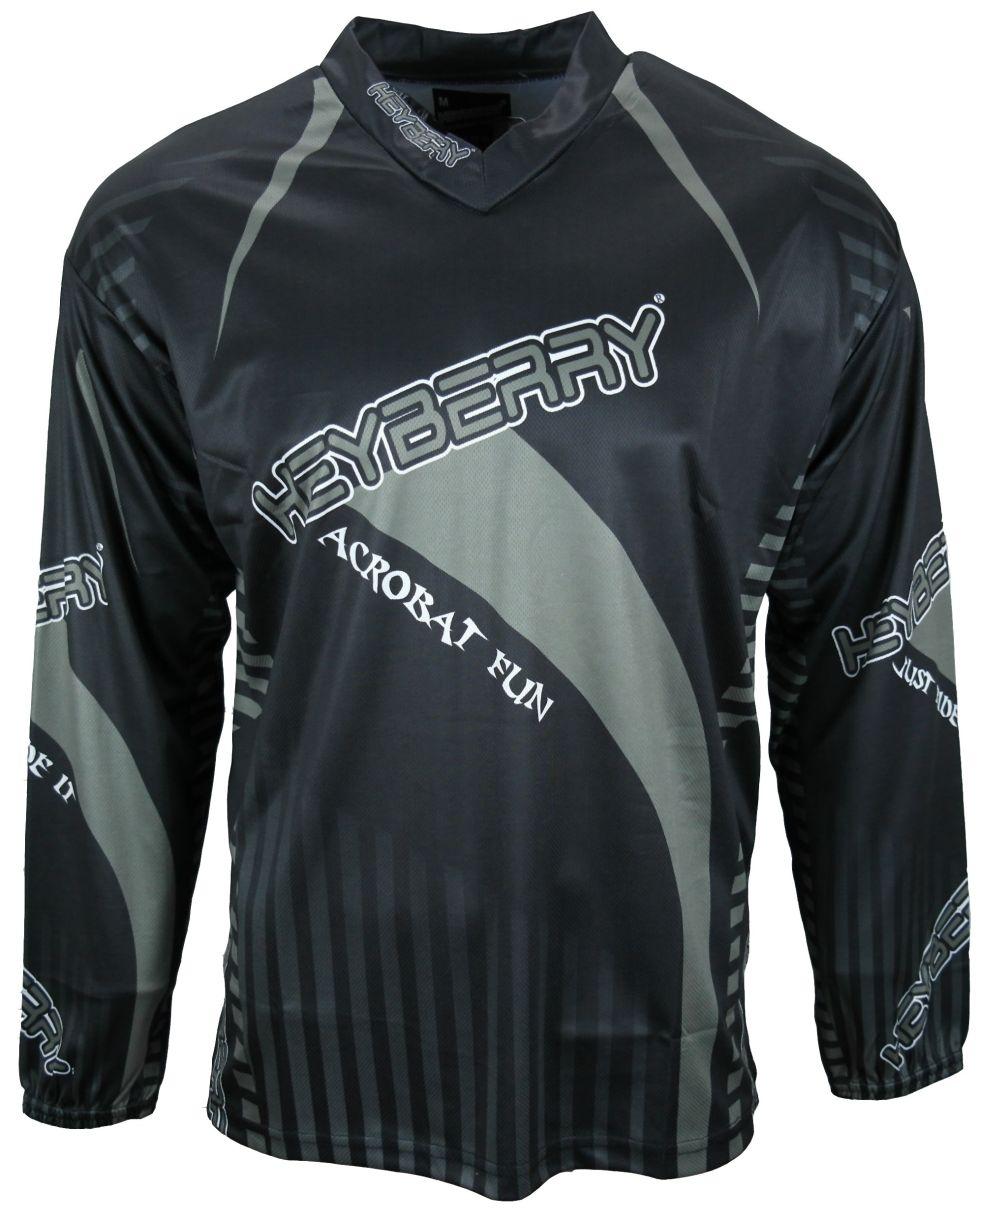 Heyberry Motocross MX Shirt Jersey Trikot schwarz grau Größe M L XL XXL